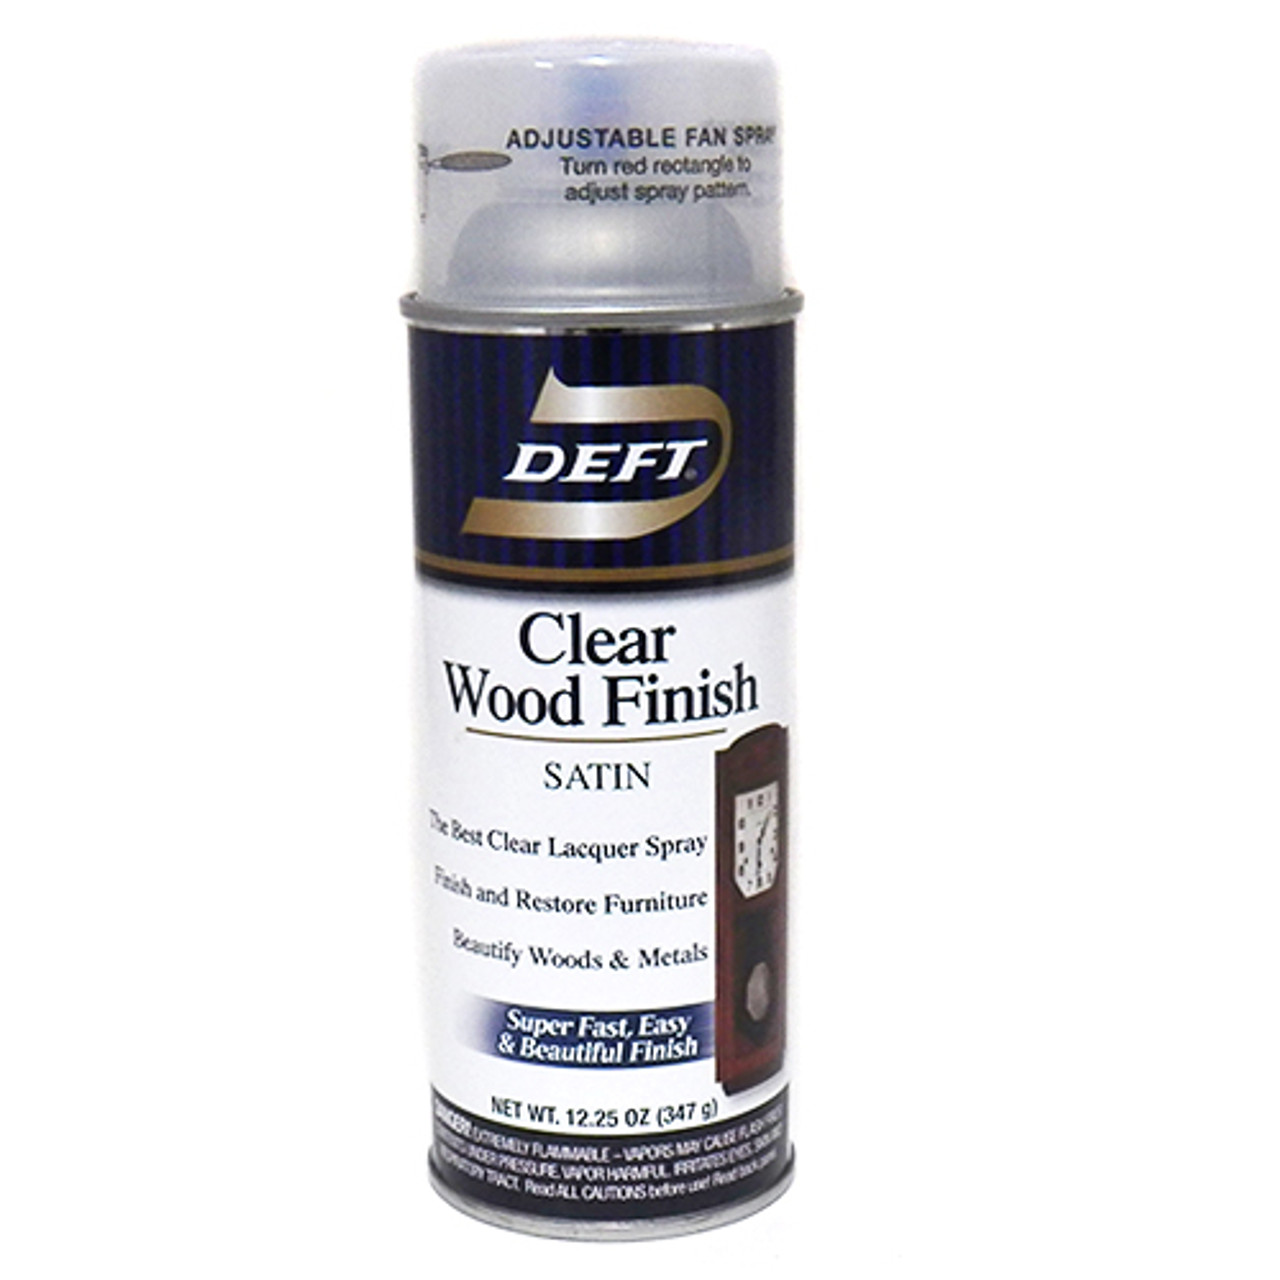 Deft Clear Wood Finish Satin Aerosol